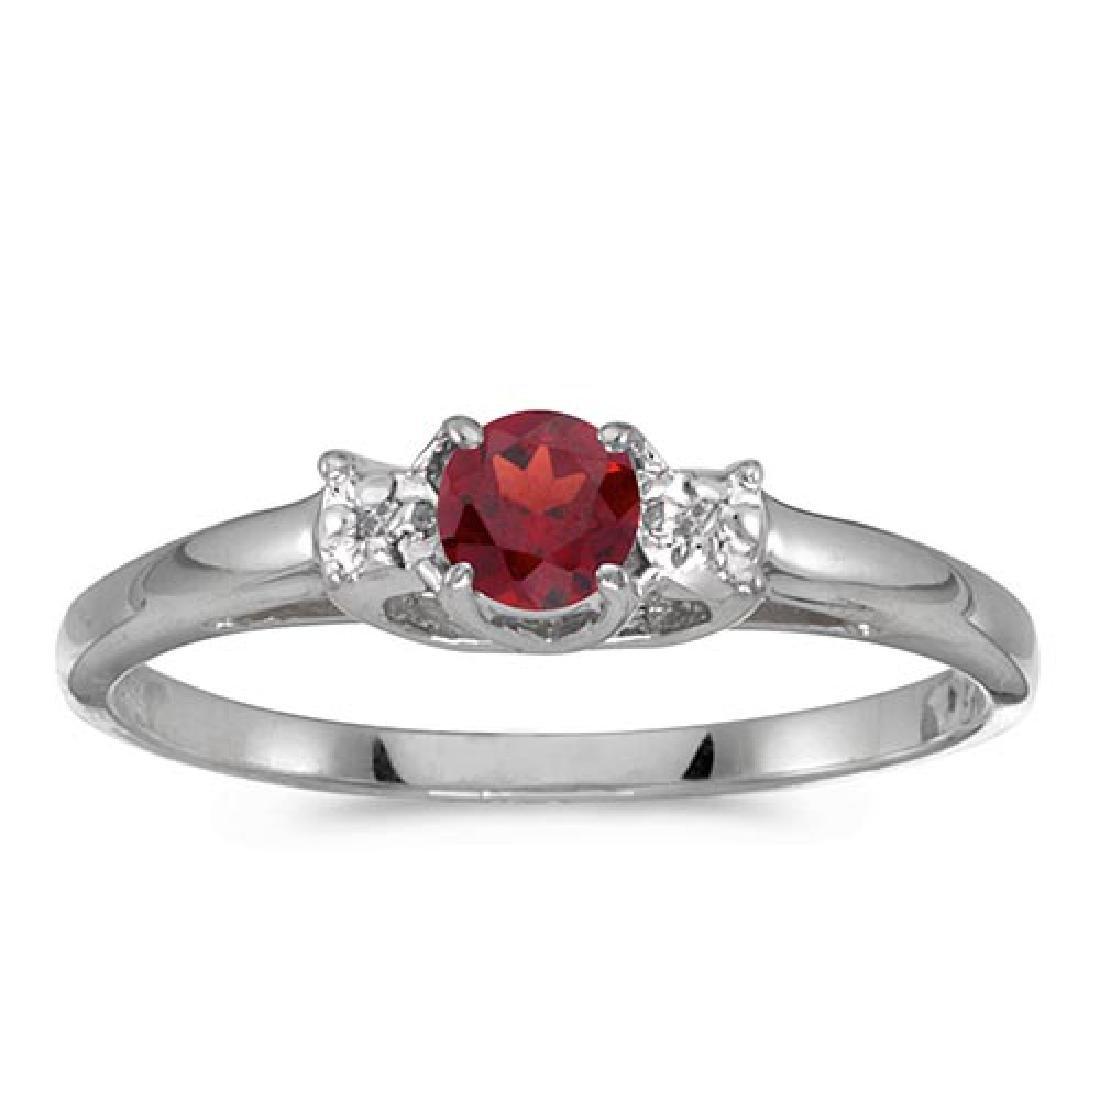 Certified 10k White Gold Round Garnet And Diamond Ring